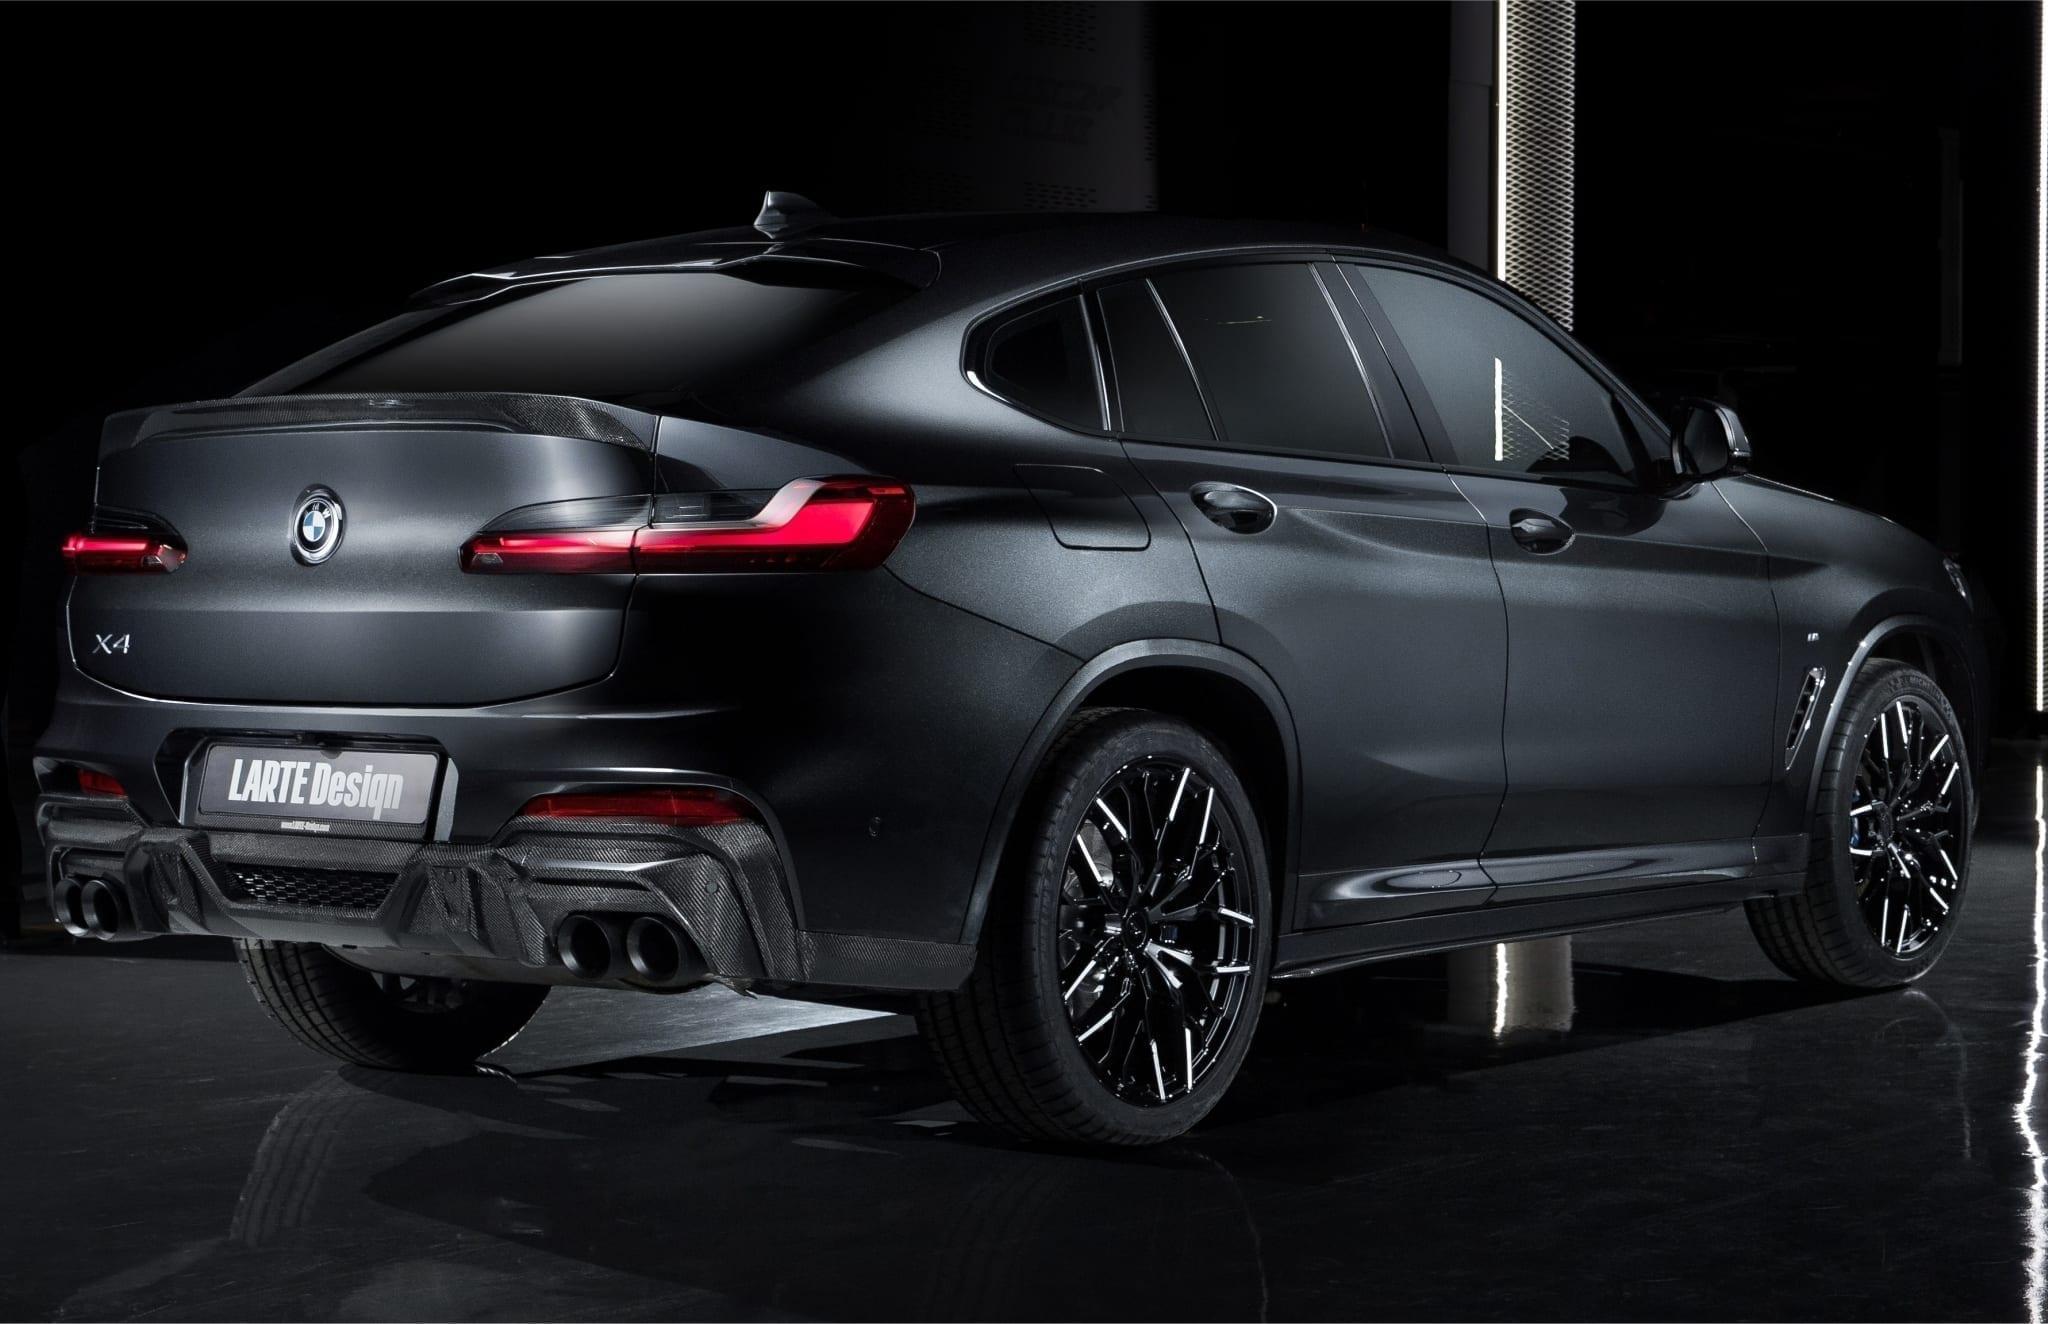 Manhart-Larte-Design-BMW-X3-X4-6